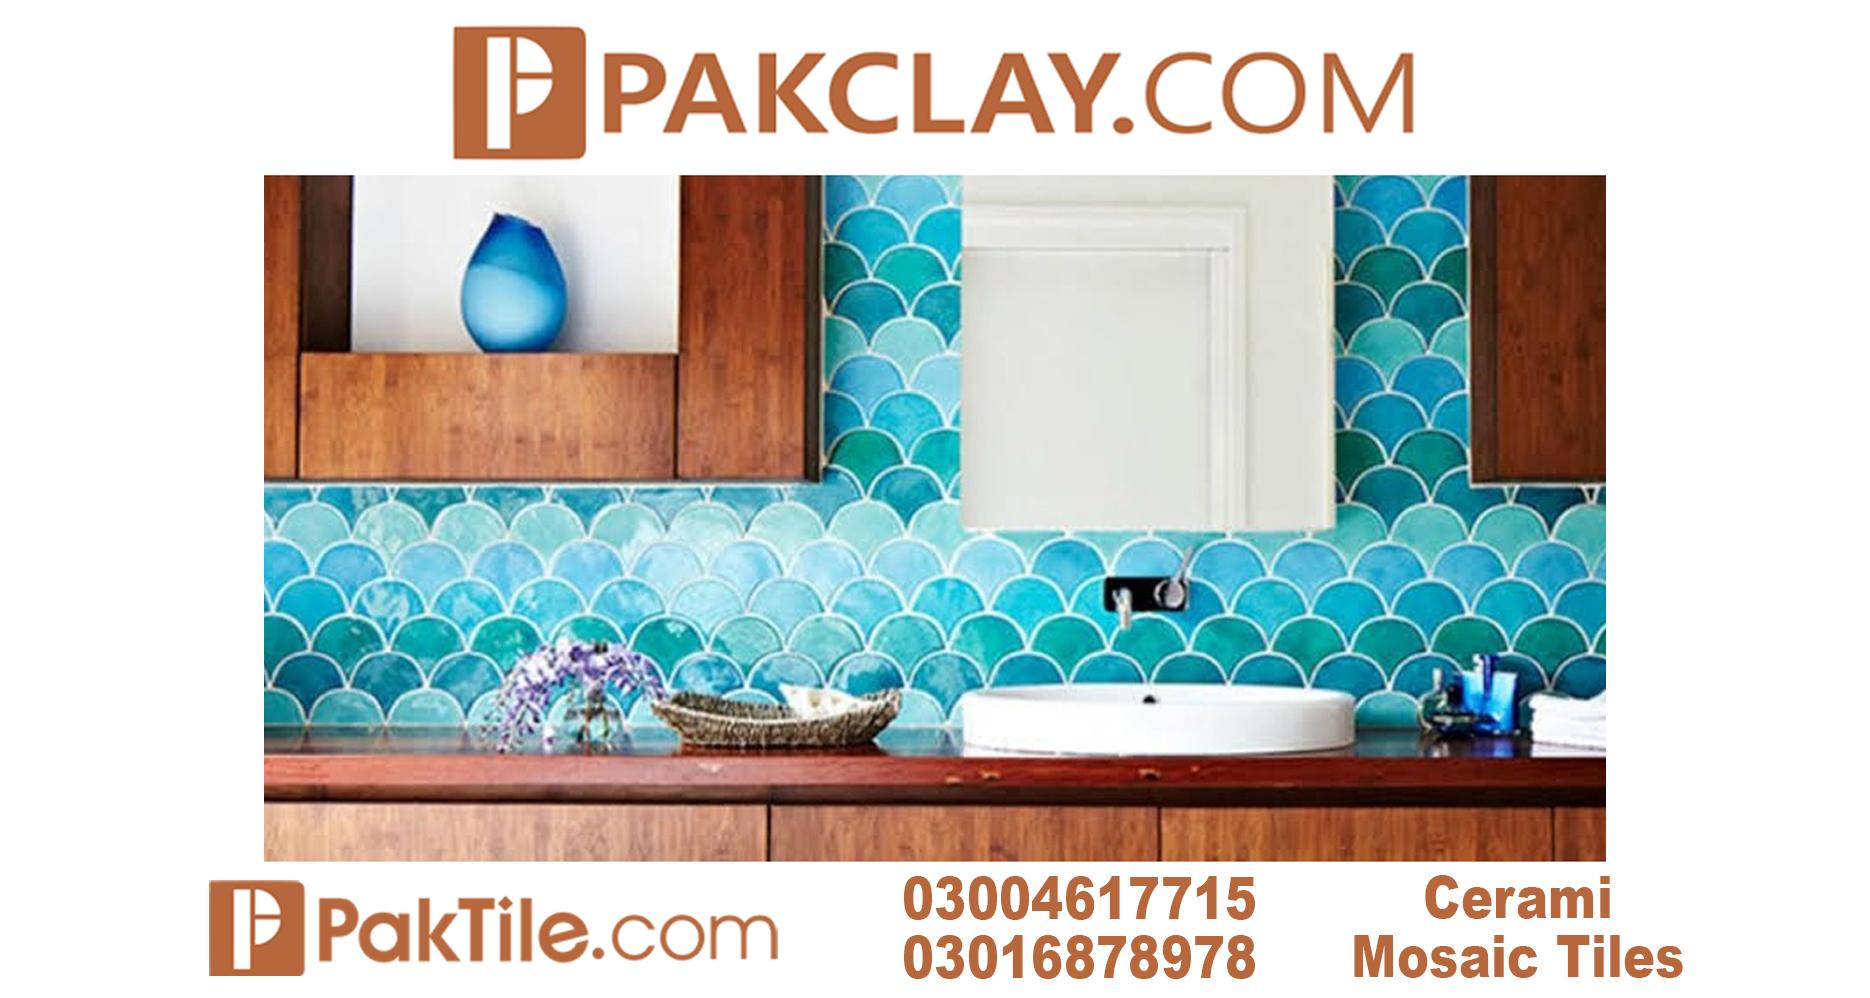 020 Kitche Mosaic Wall Tiles